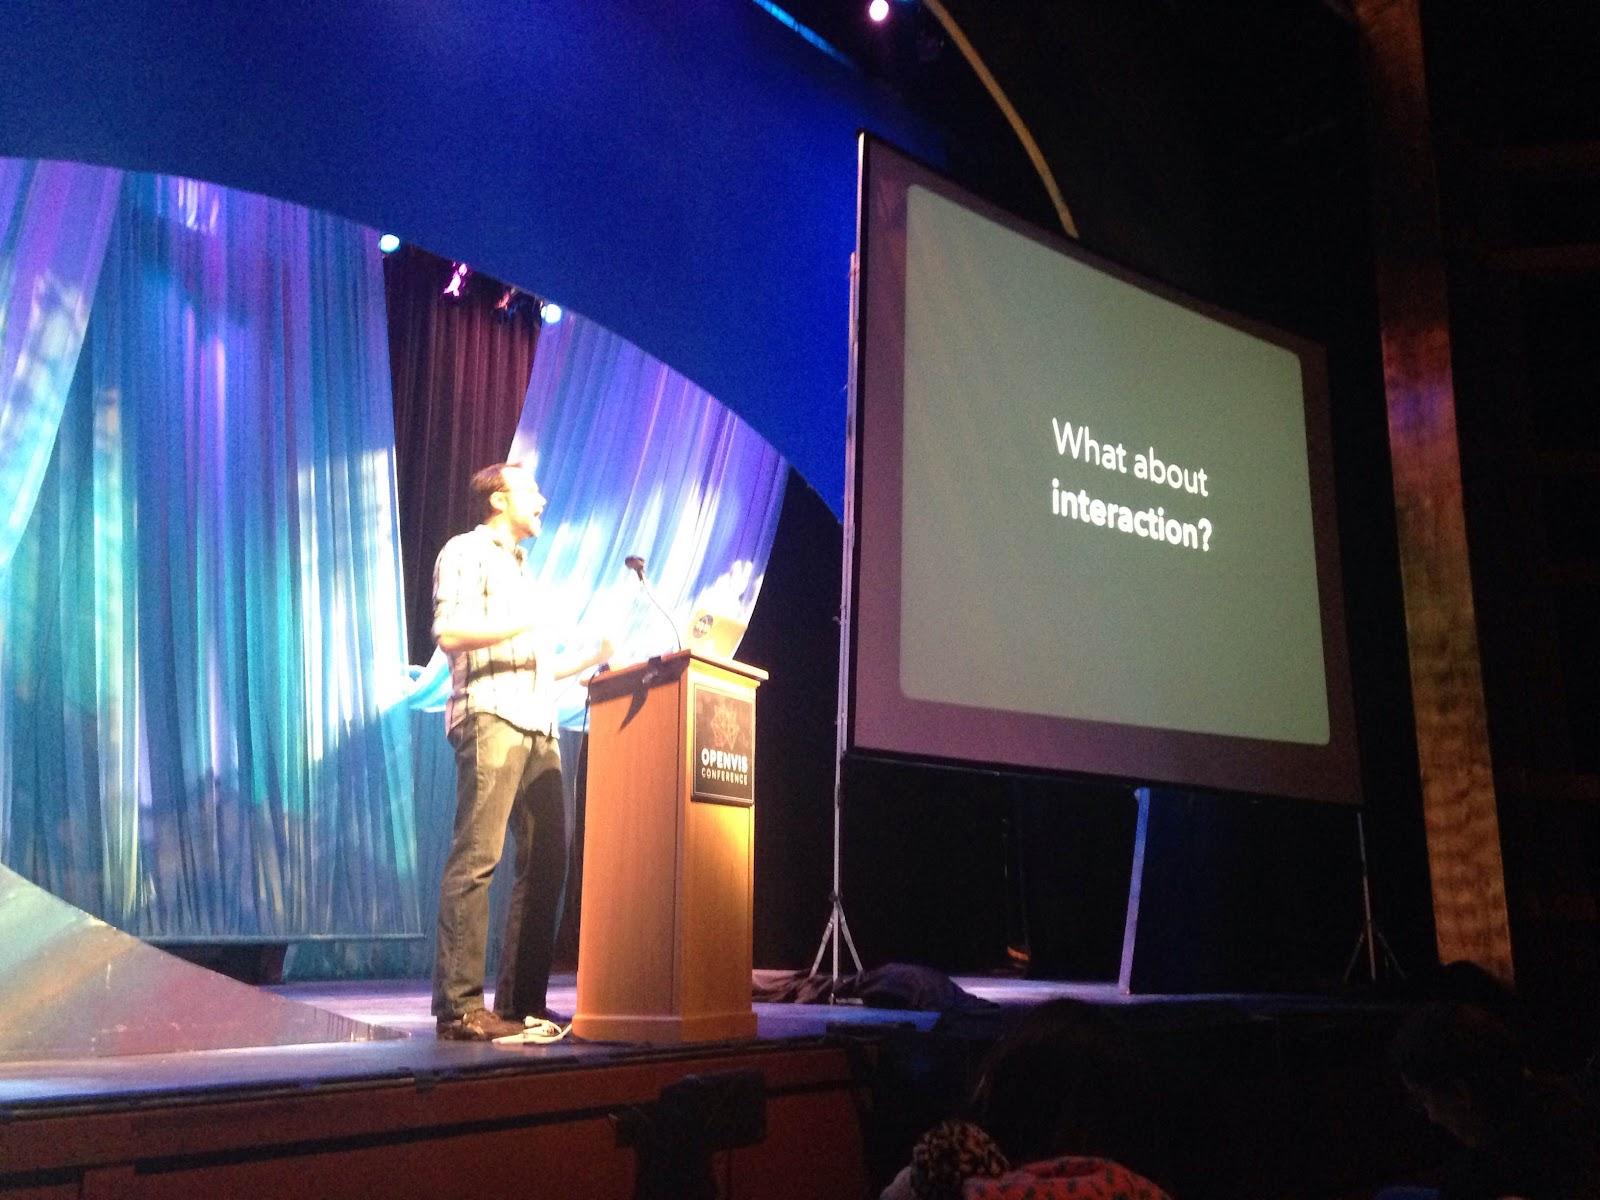 OpenVisConf: Keynote by Jeffrey Heer